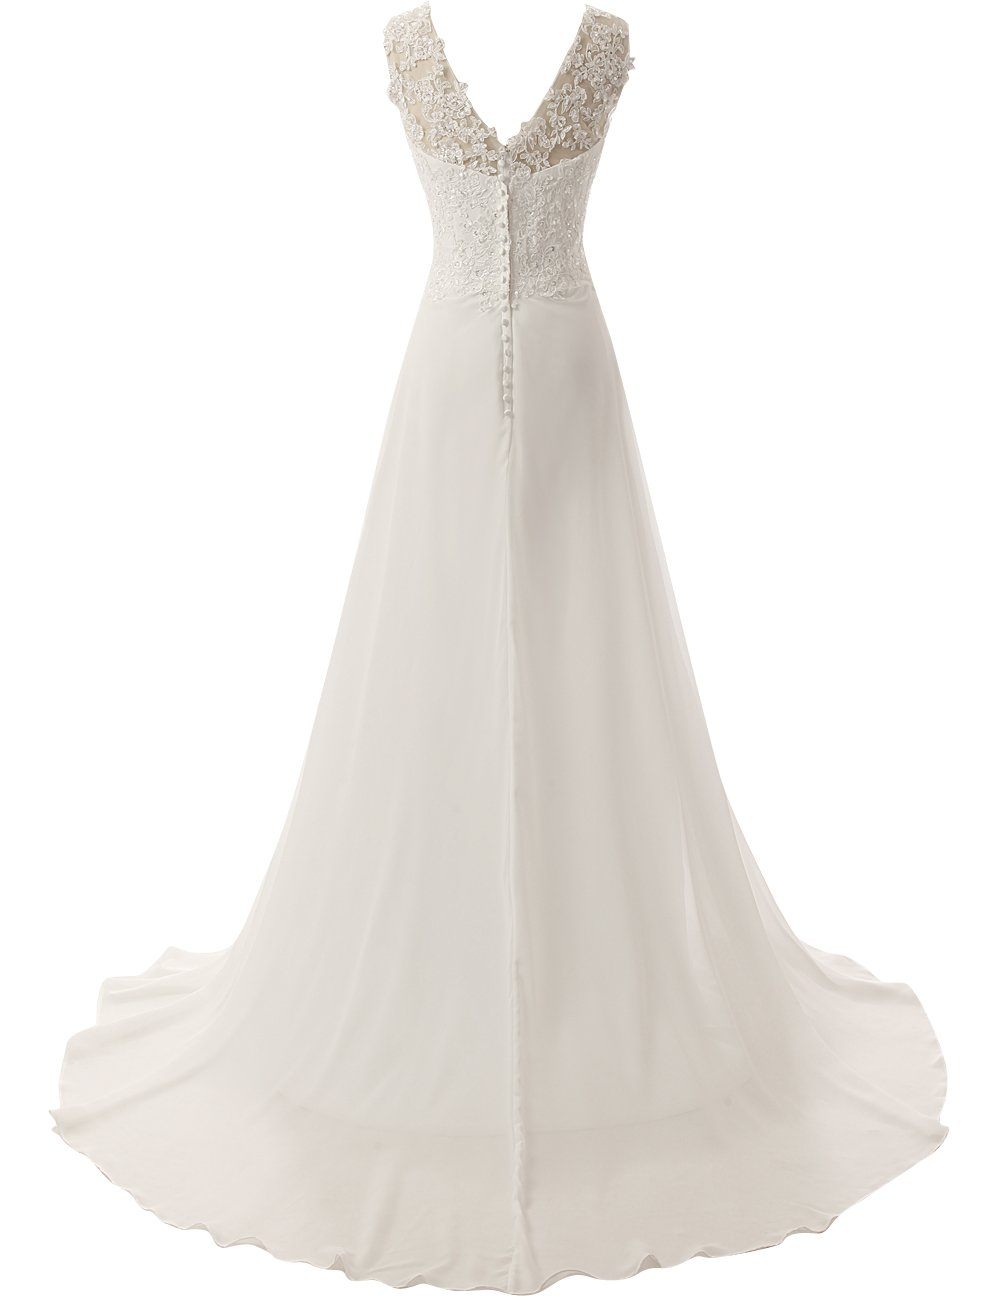 JAEDEN Elegant Lace Beach Wedding Dresses Chiffon V Neck A Line Long Bridal Gown White US22W by JAEDEN (Image #2)